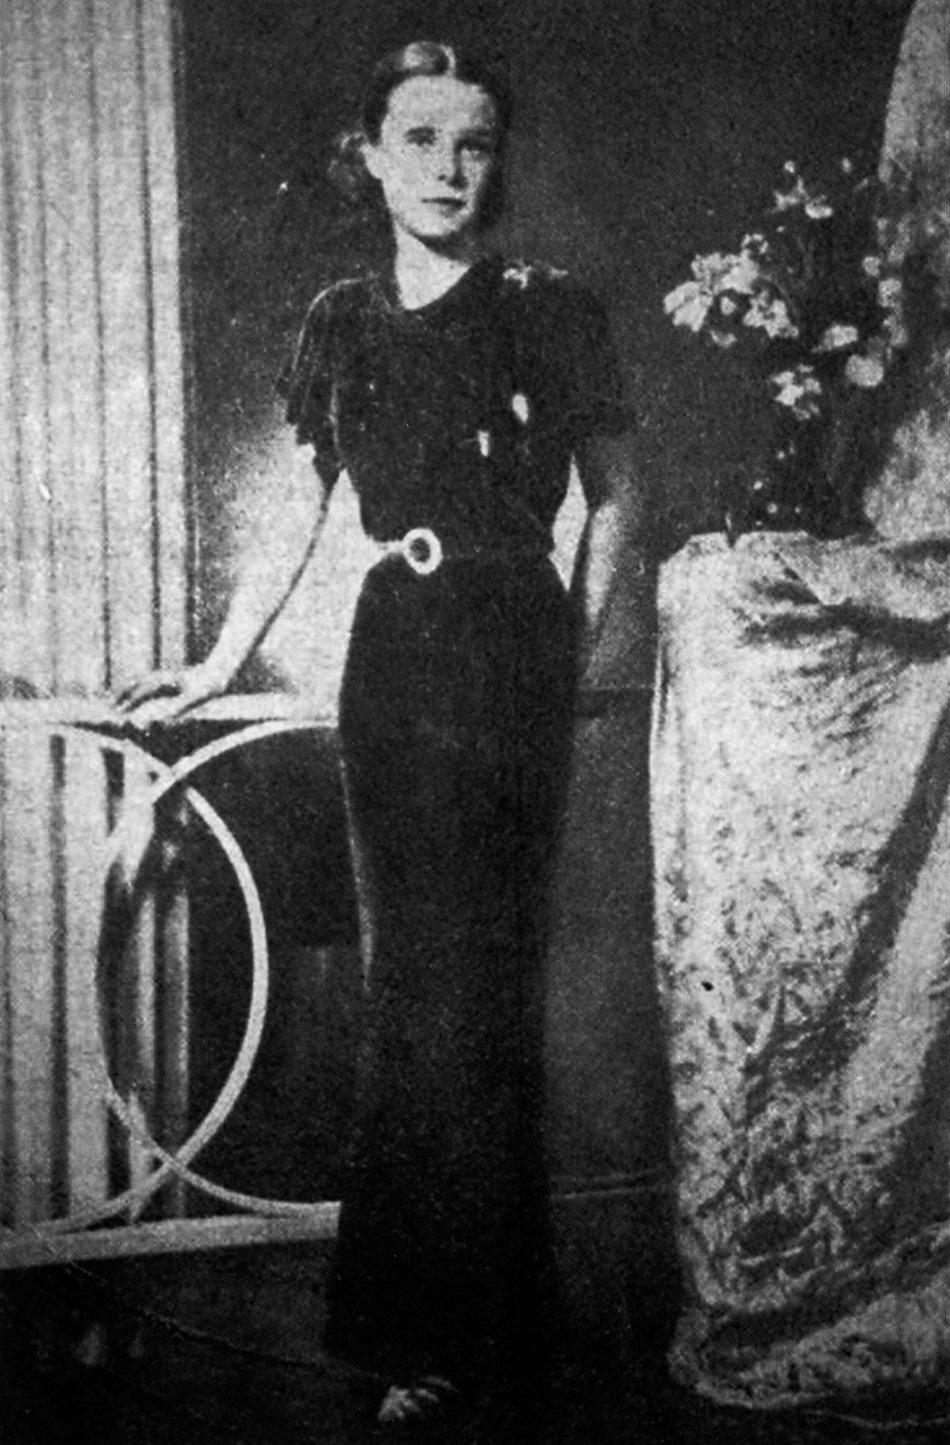 A studio portrait of Pamela Werner, who was murdered in Peking in 1937